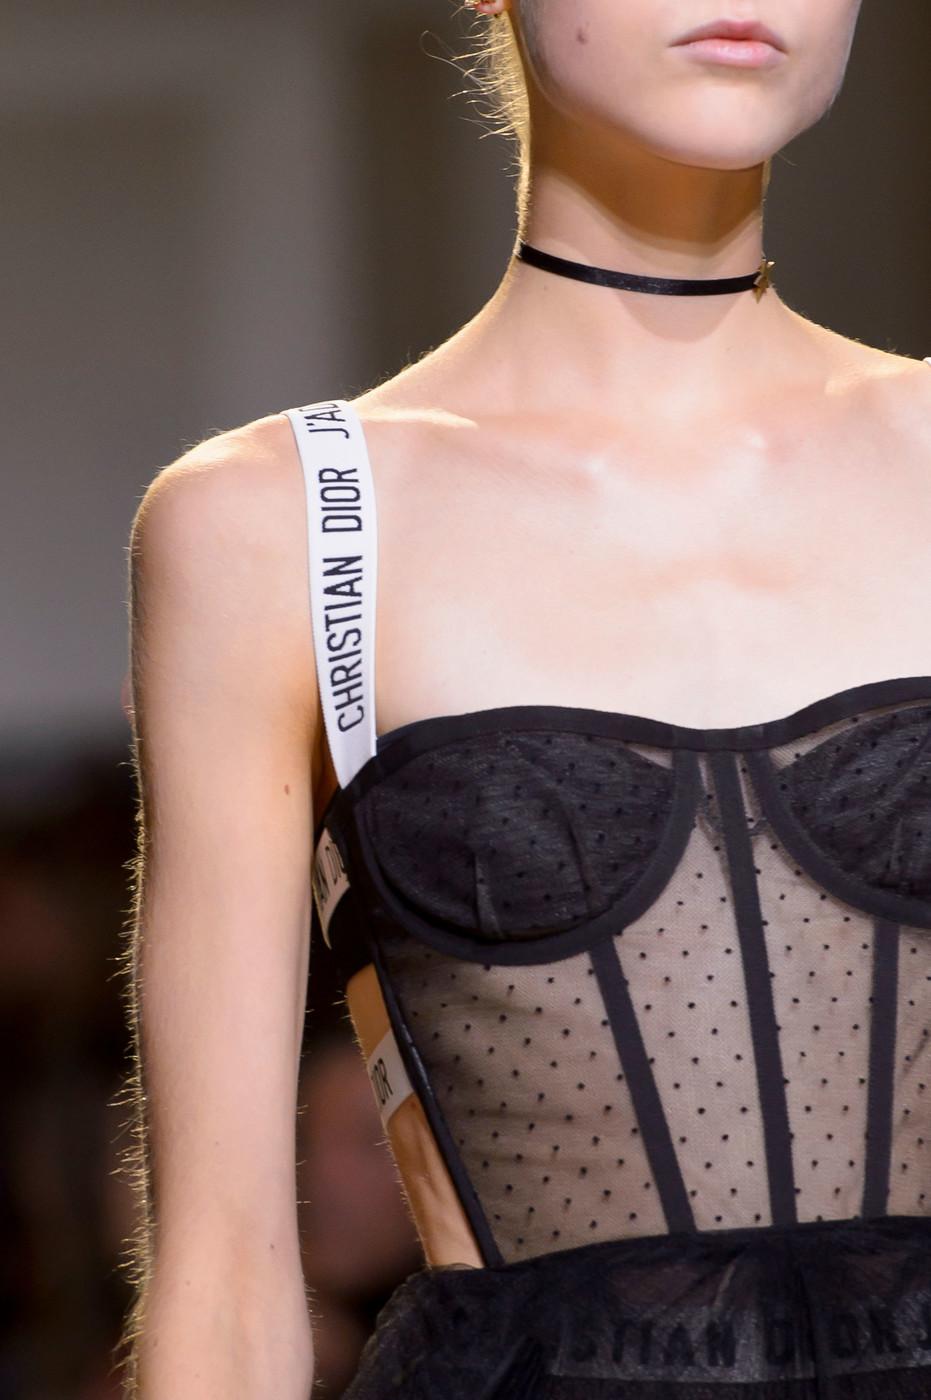 Christian+Dior+Spring+2017+Details+zJGRA2rHHvPx.jpg